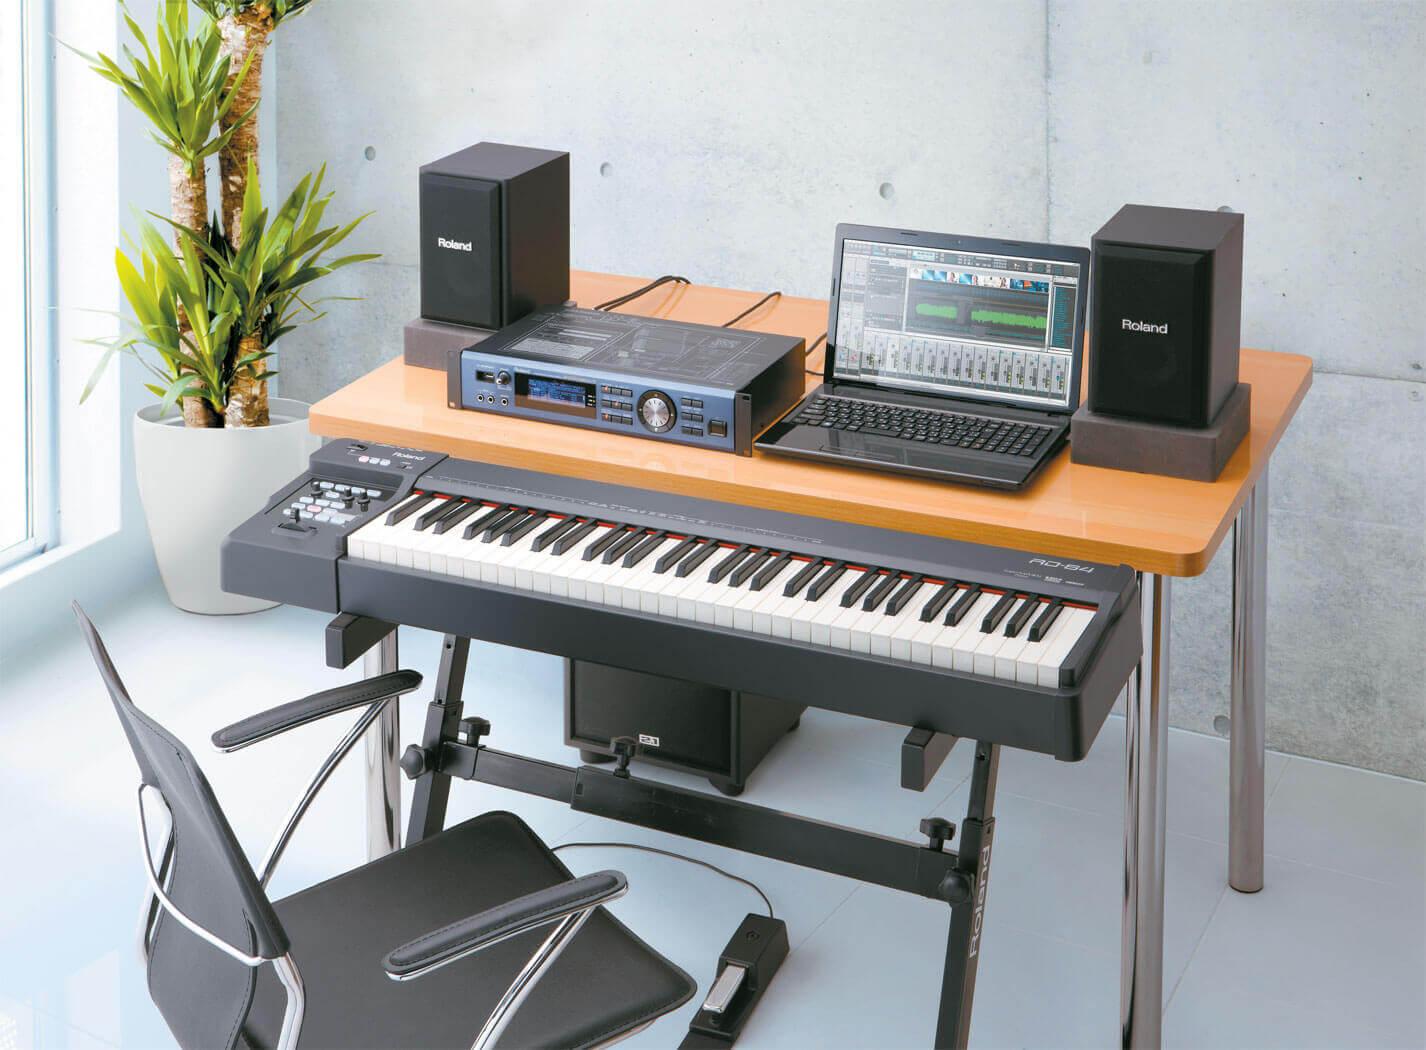 罗兰 Roland RD-64 便携 64键 电钢琴